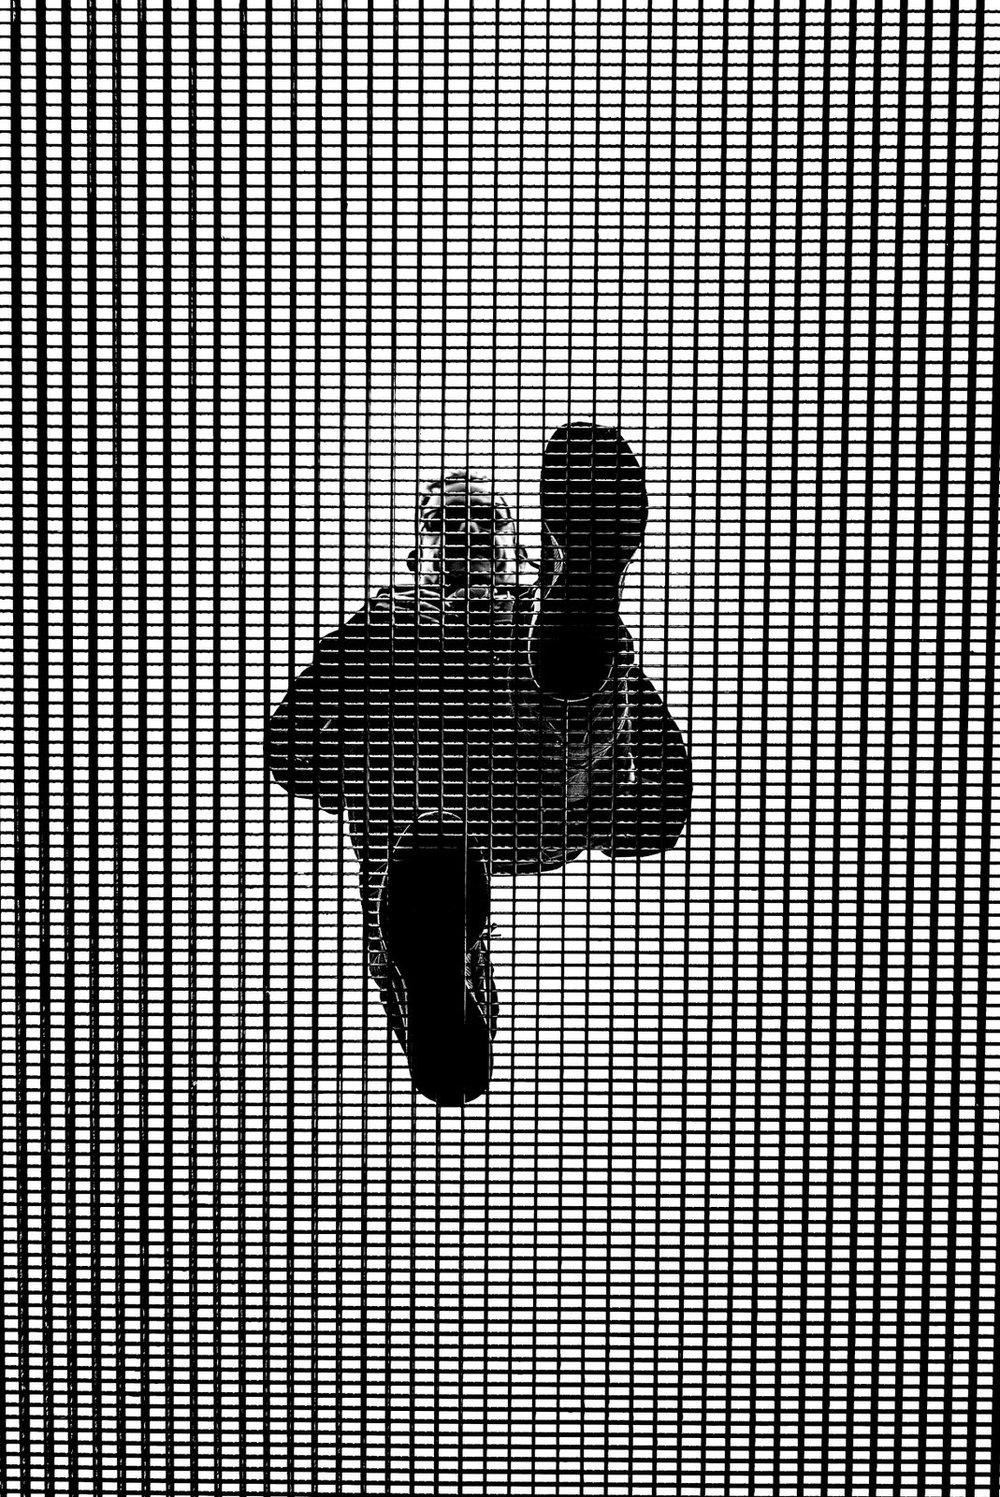 Alan Schaller - London Street Photographer - Metropolis16.jpg